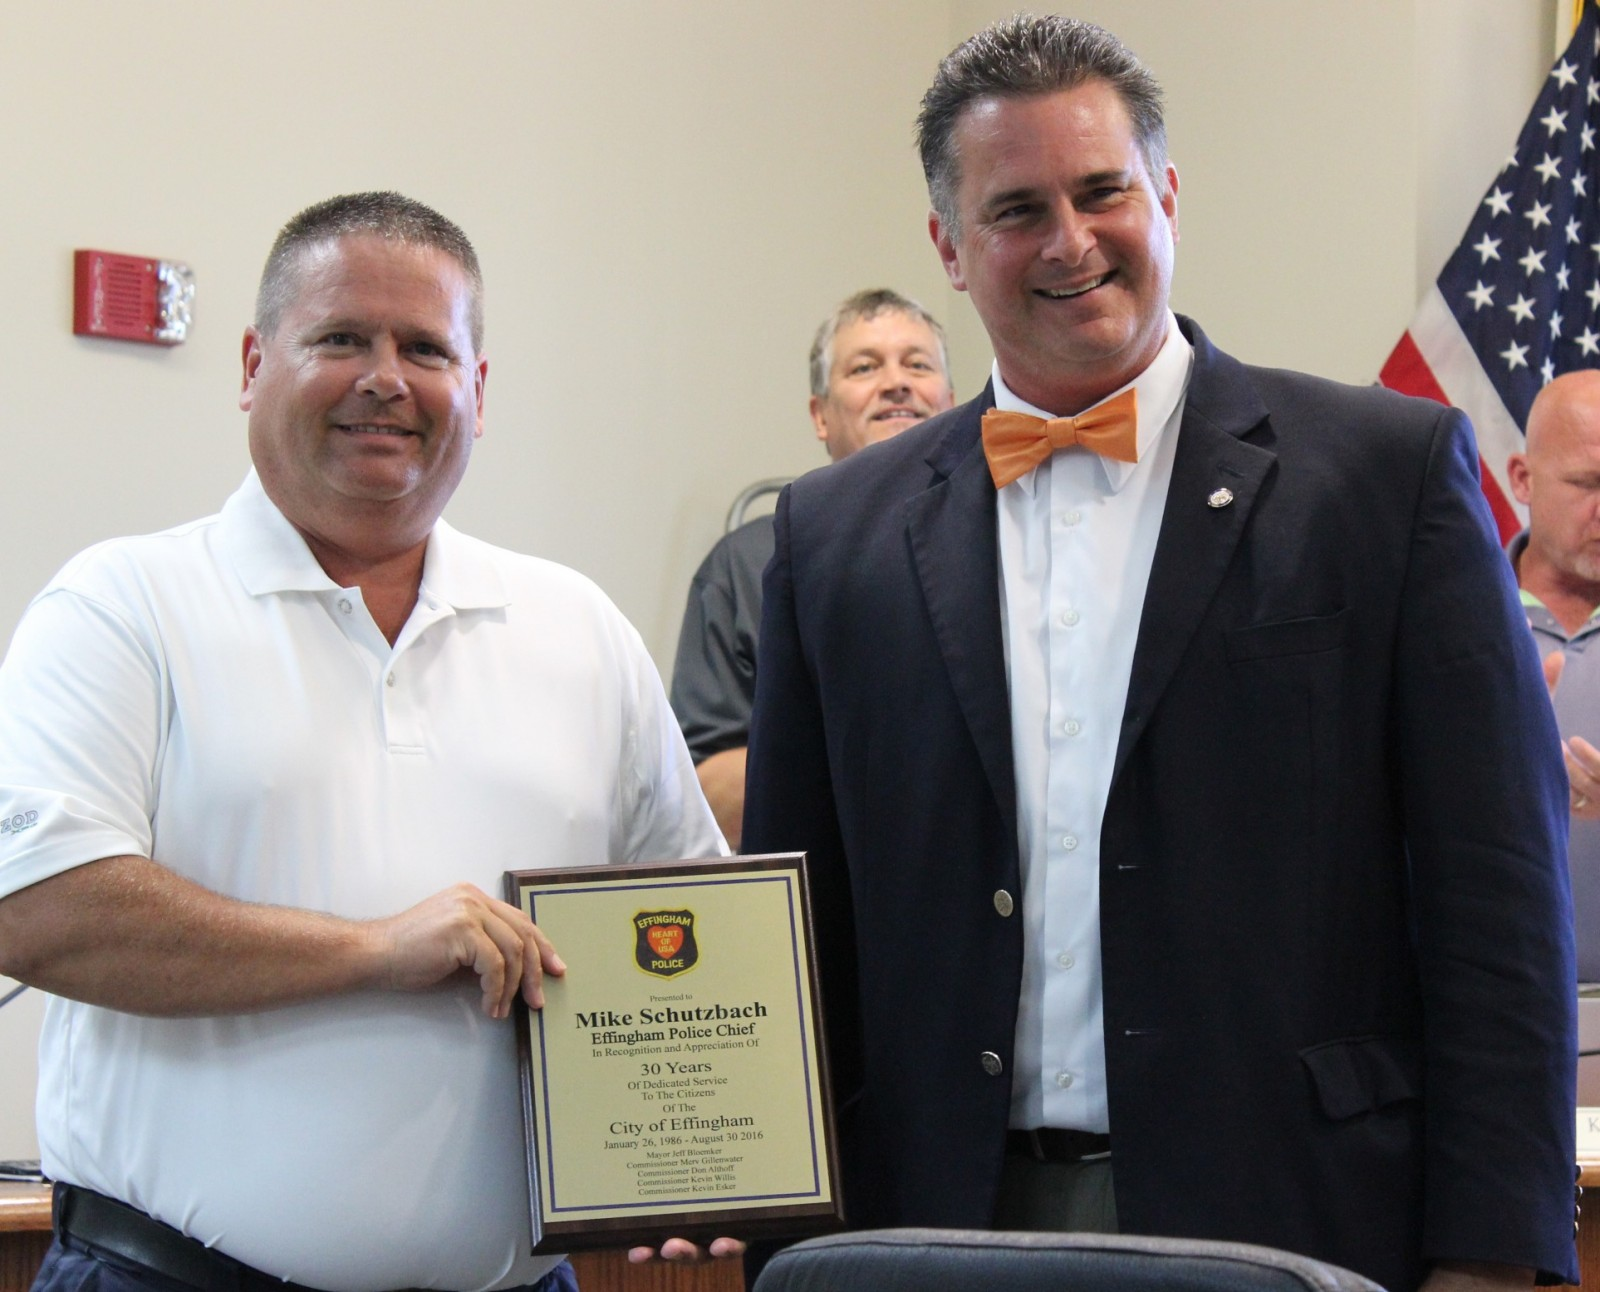 Left: Retired Police Chief Mike Schutzbach; Right Effingham Mayor Jeff Bloemker